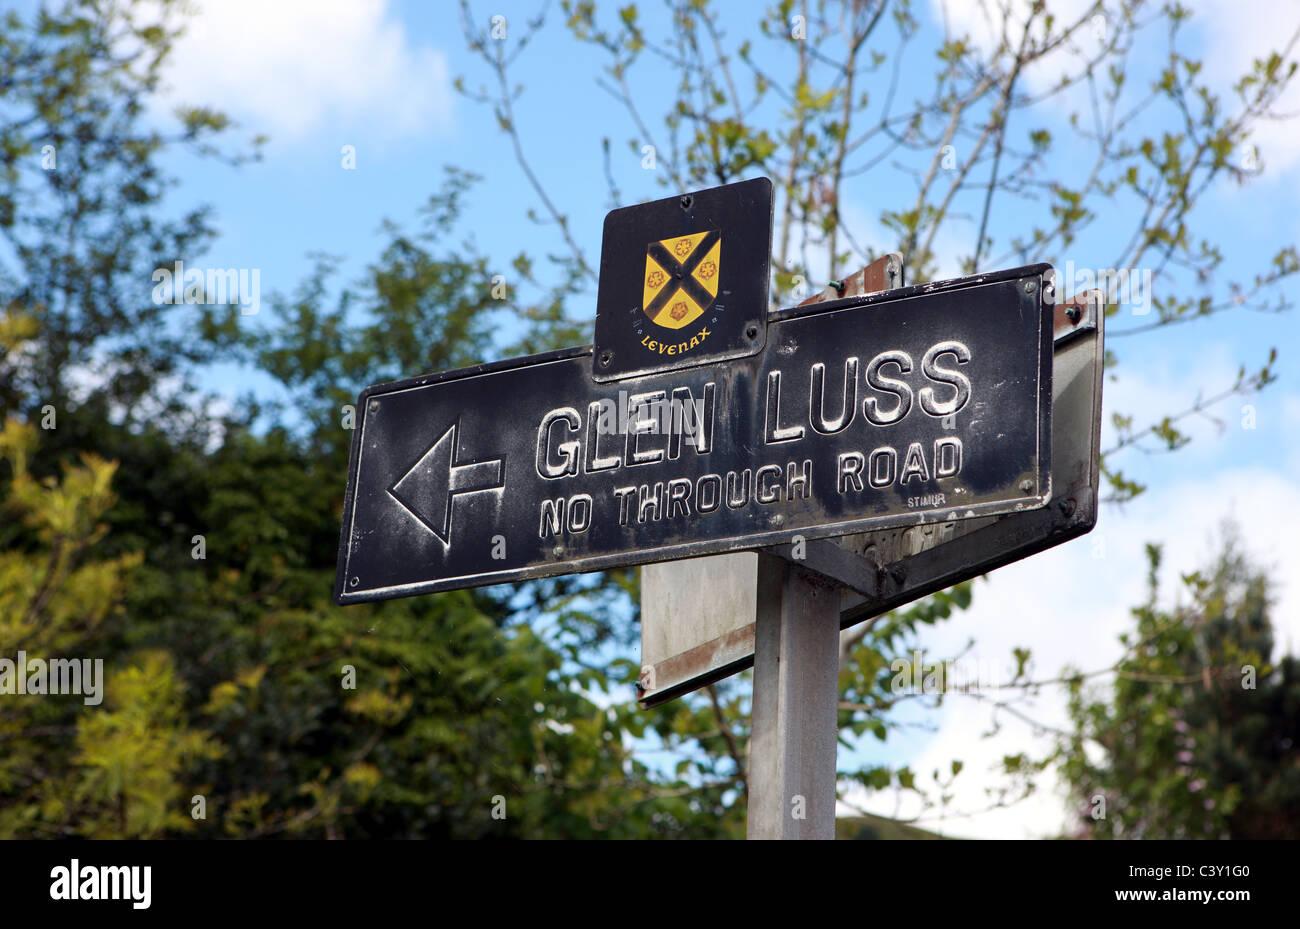 Glen Luss directional sign - Stock Image